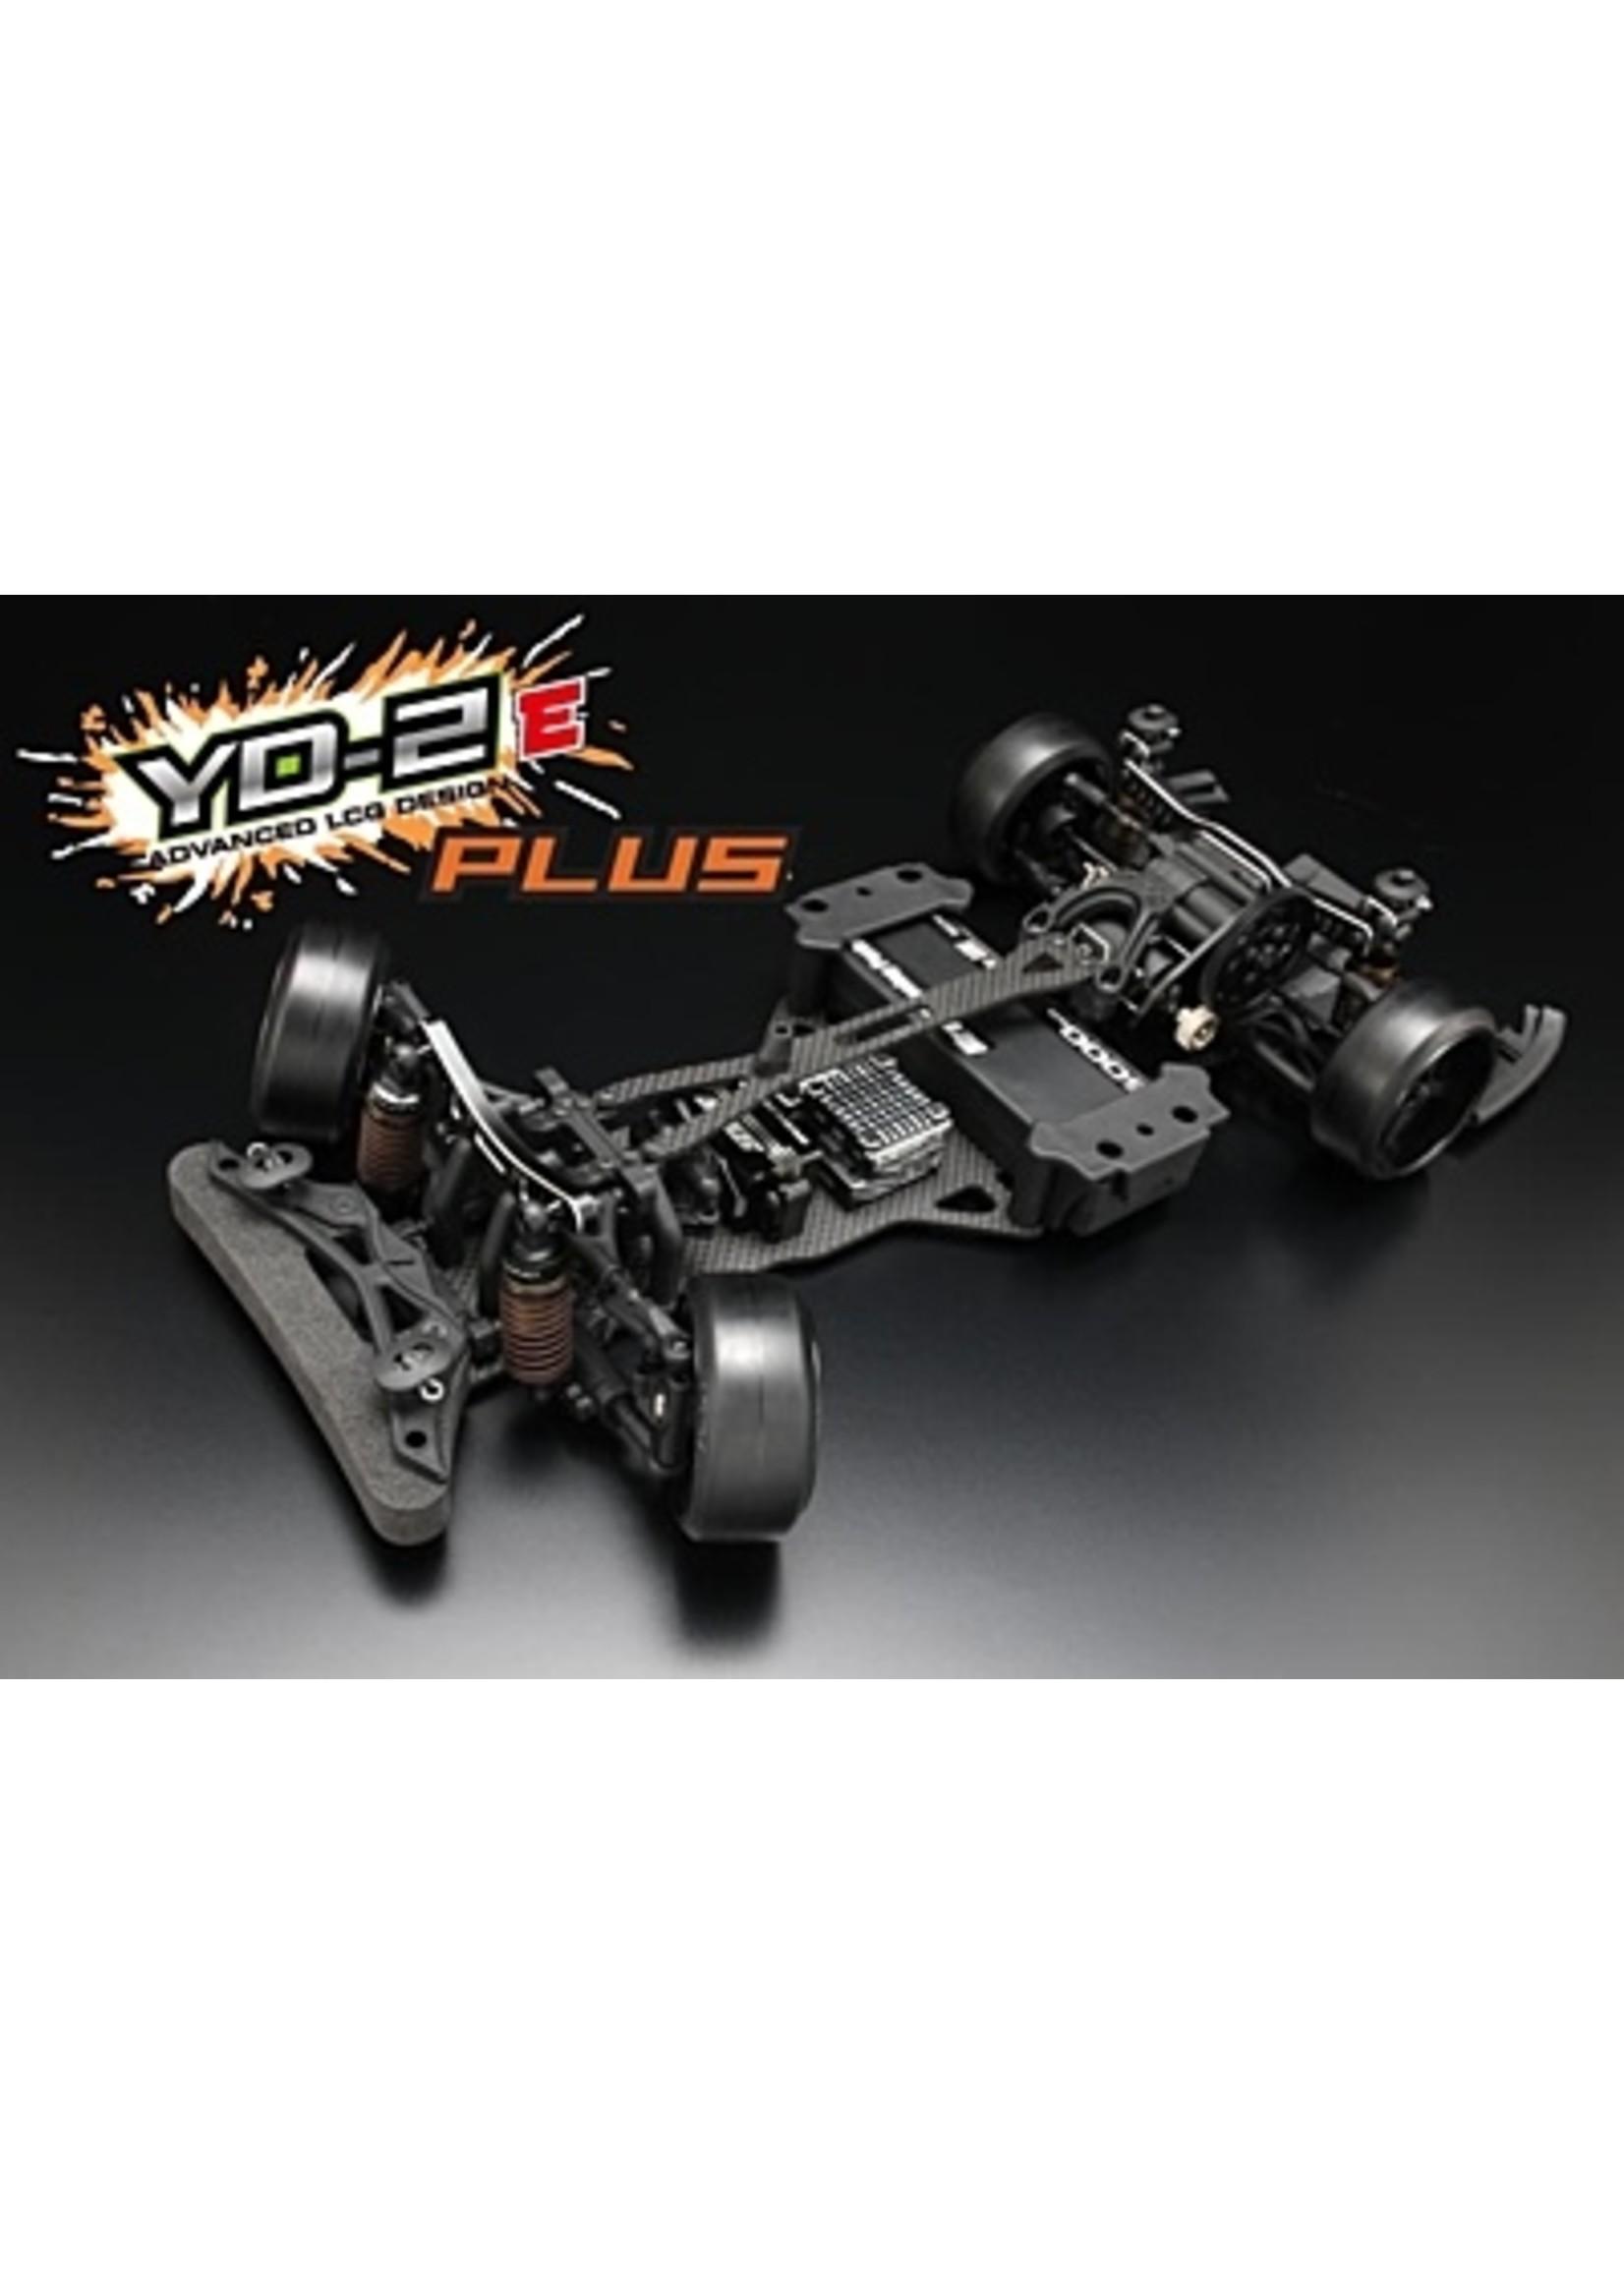 Yokomo Yokomo YD-2E Plus RWD Drift Car Kit DP-YD2EPLS